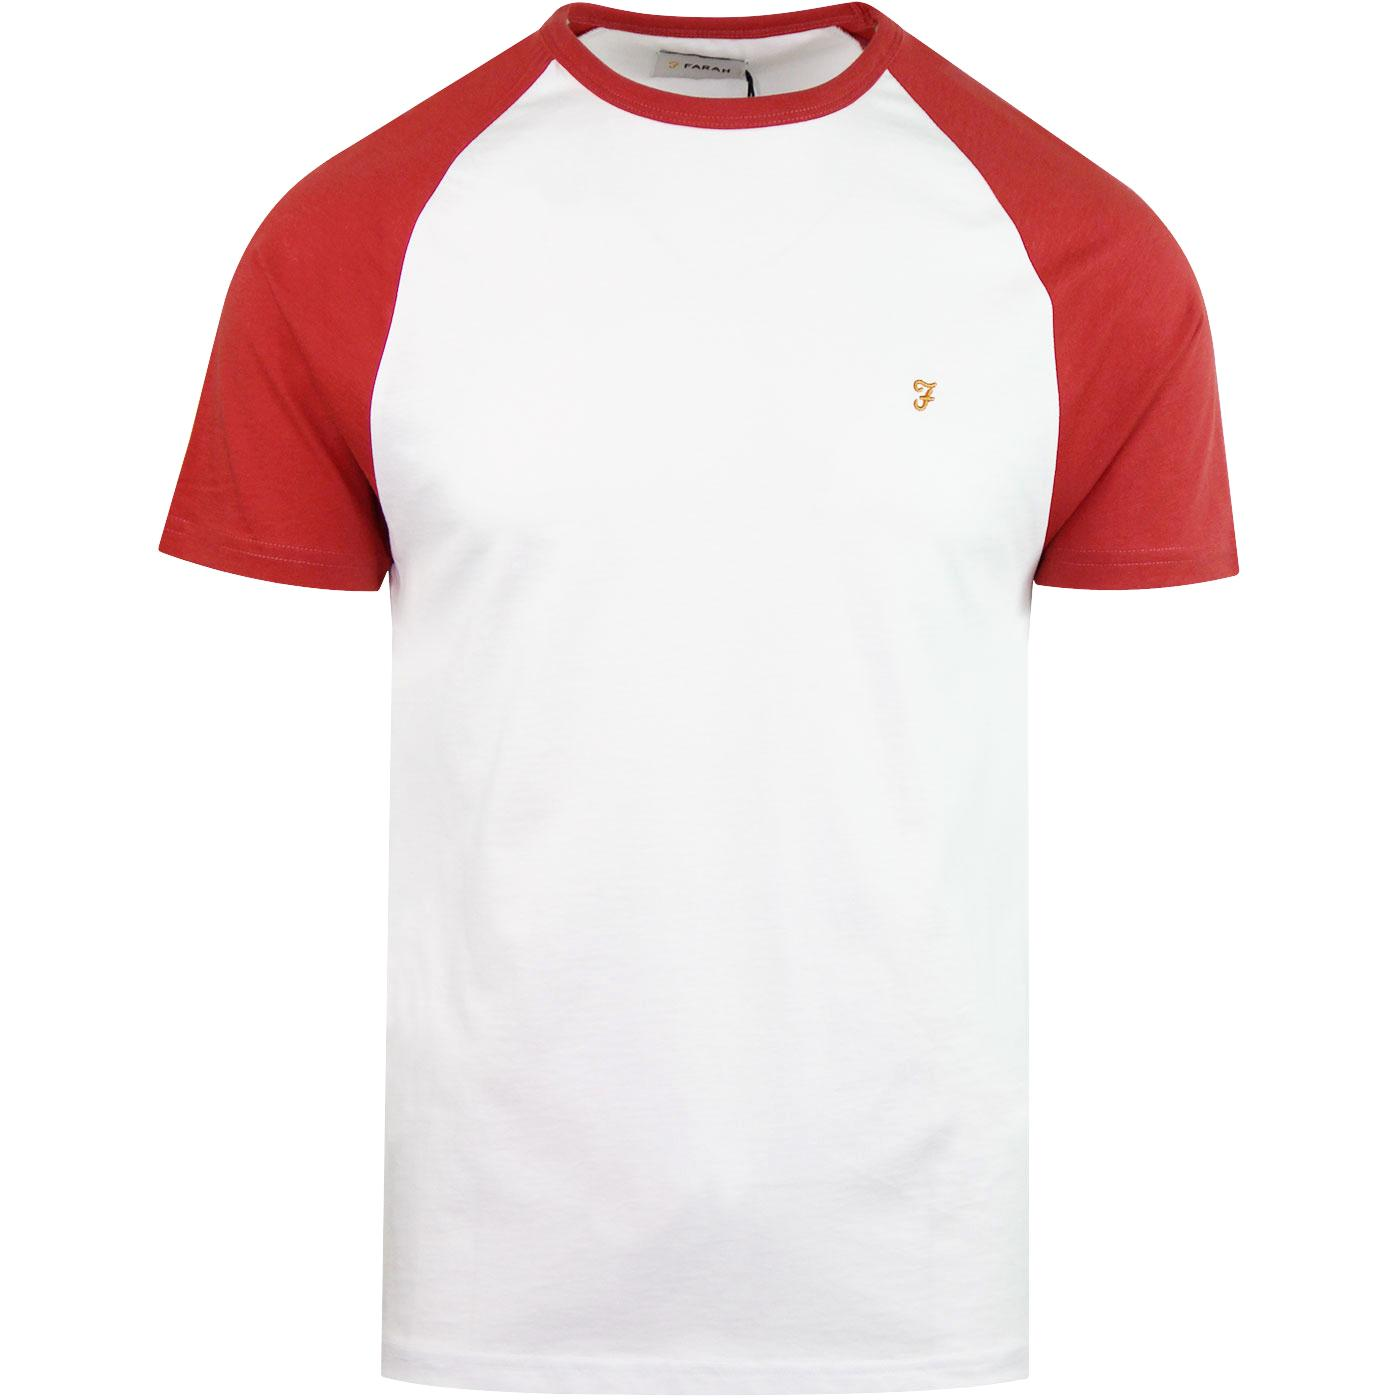 Zemlak FARAH Retro 80s Raglan Baseball T-Shirt RED